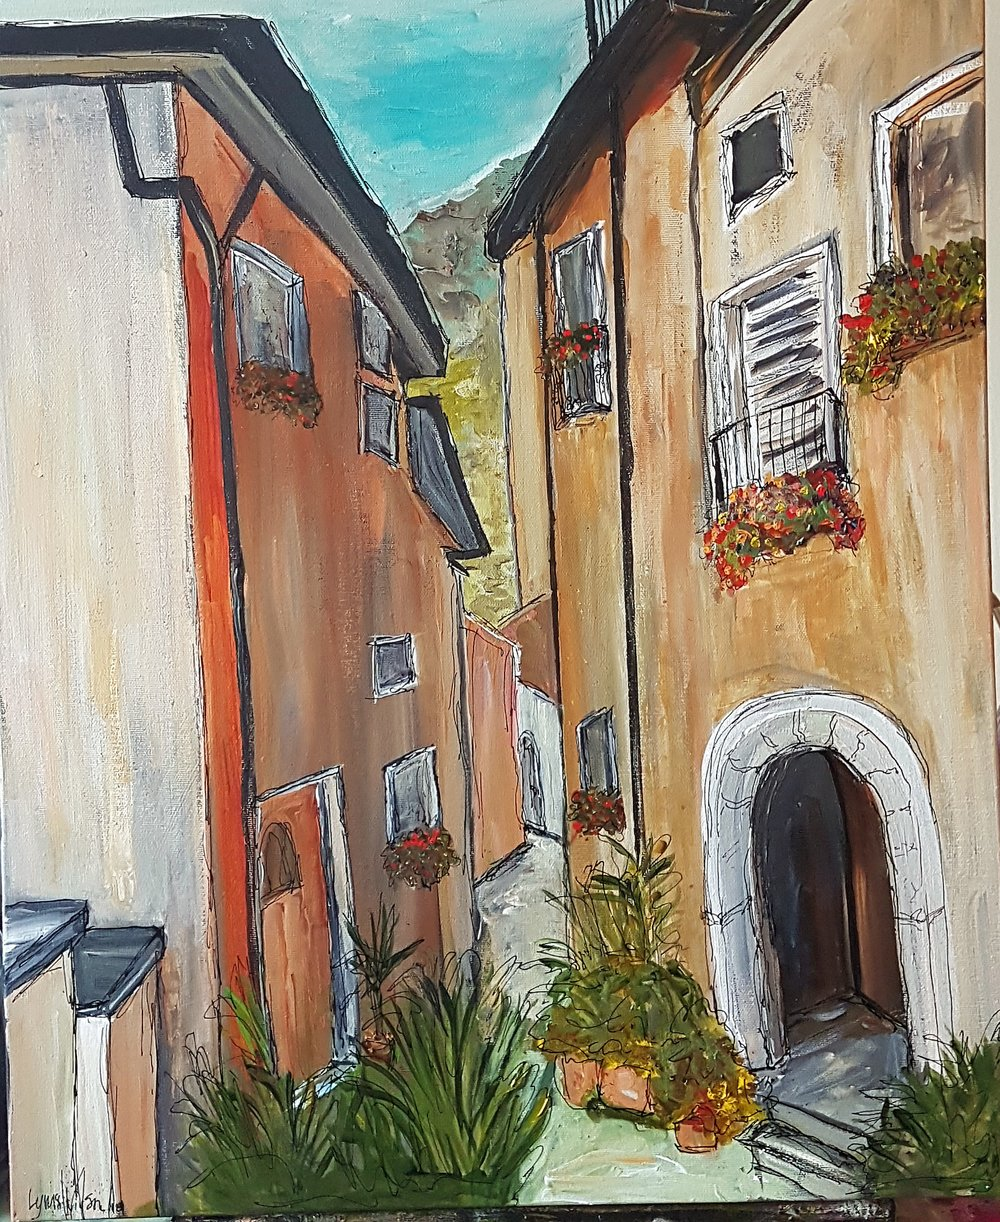 Italian Alley Painting Acrylic and India Ink Feb 3 2018 .jpg